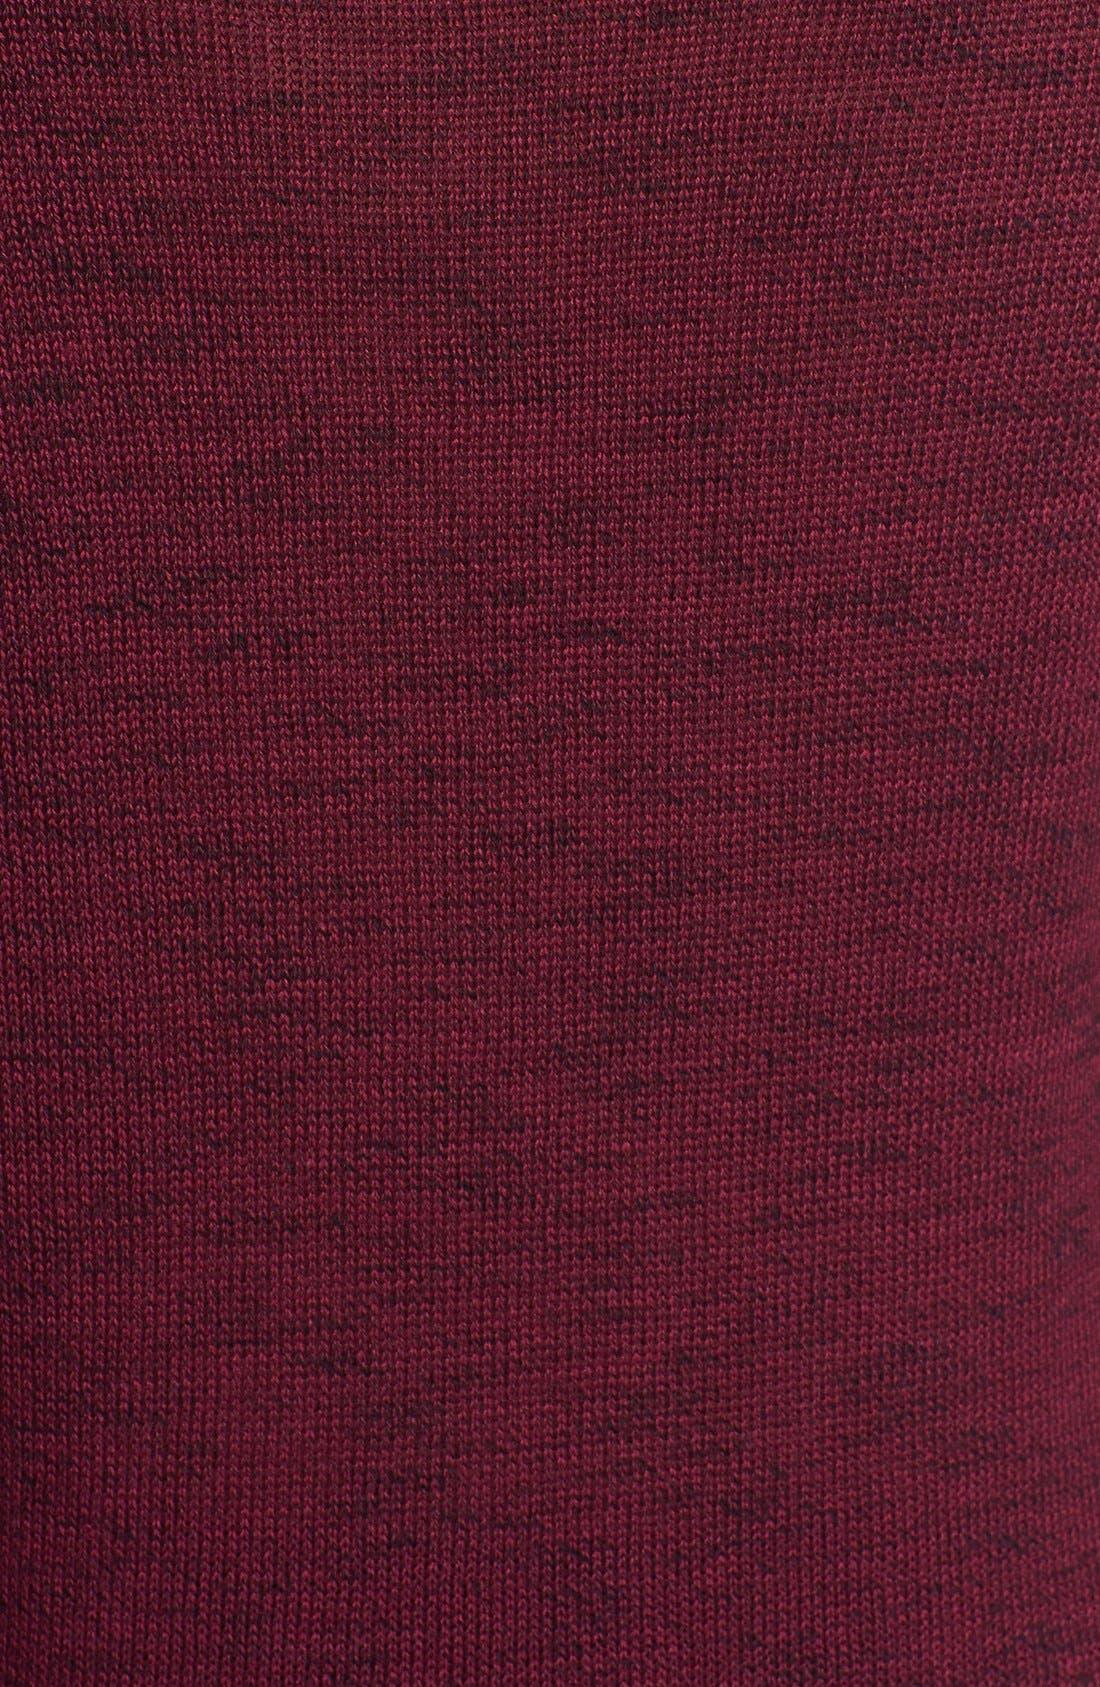 Alternate Image 3  - Halogen® Zip Pocket Tunic Sweater (Regular & Petite Focus)